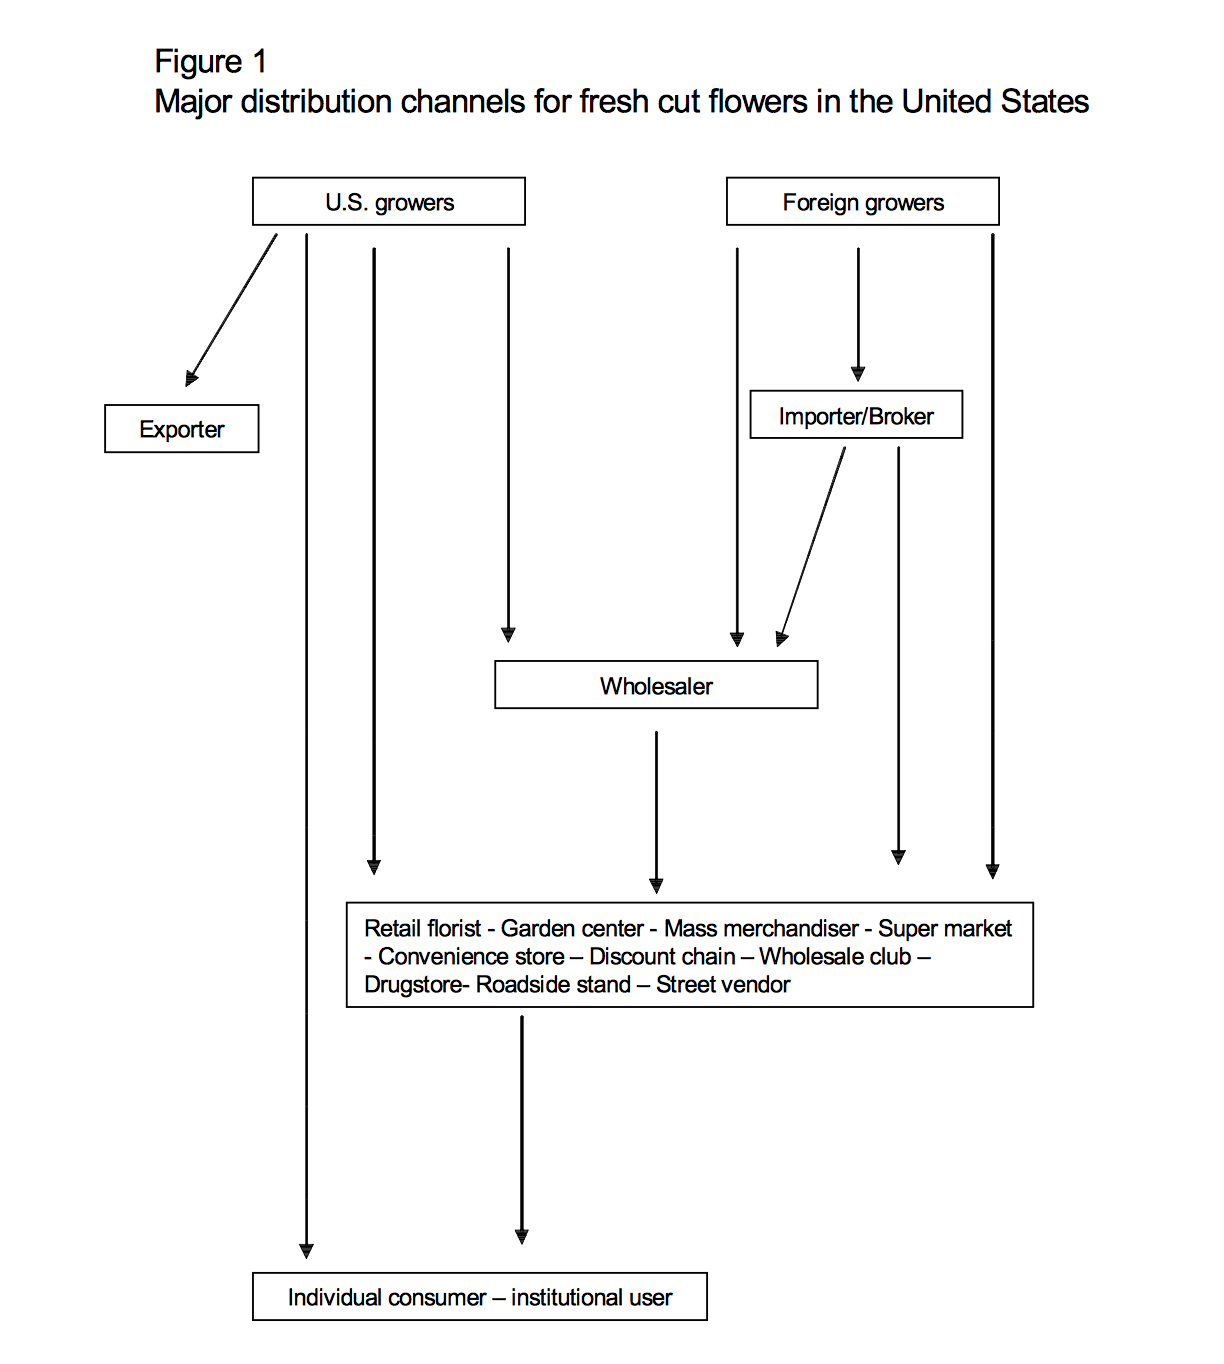 https://www.usitc.gov/publications/332/pub3580.pdf